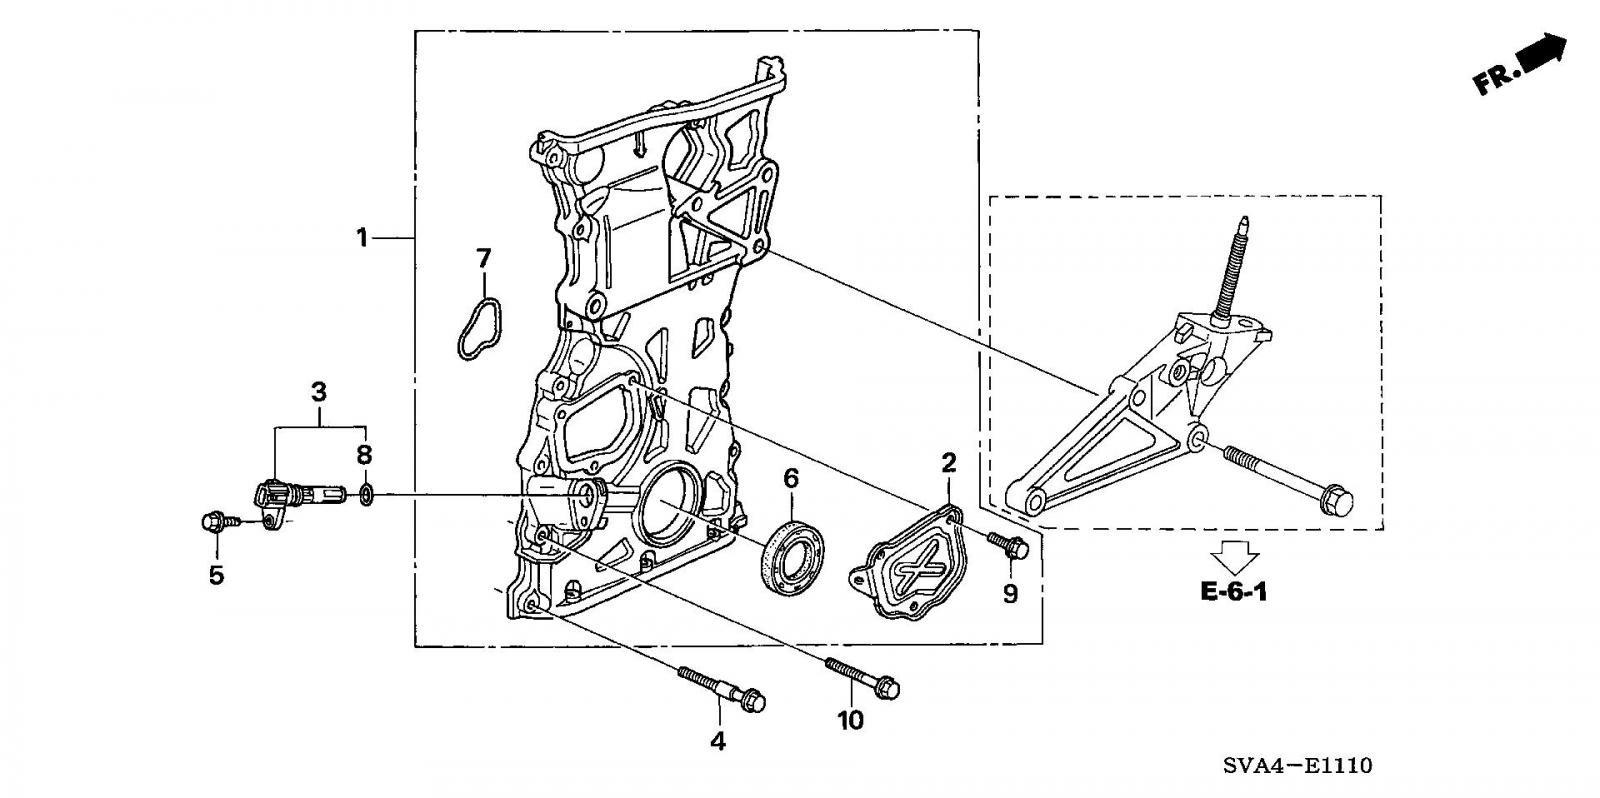 2008 Honda Civic Timing Chain